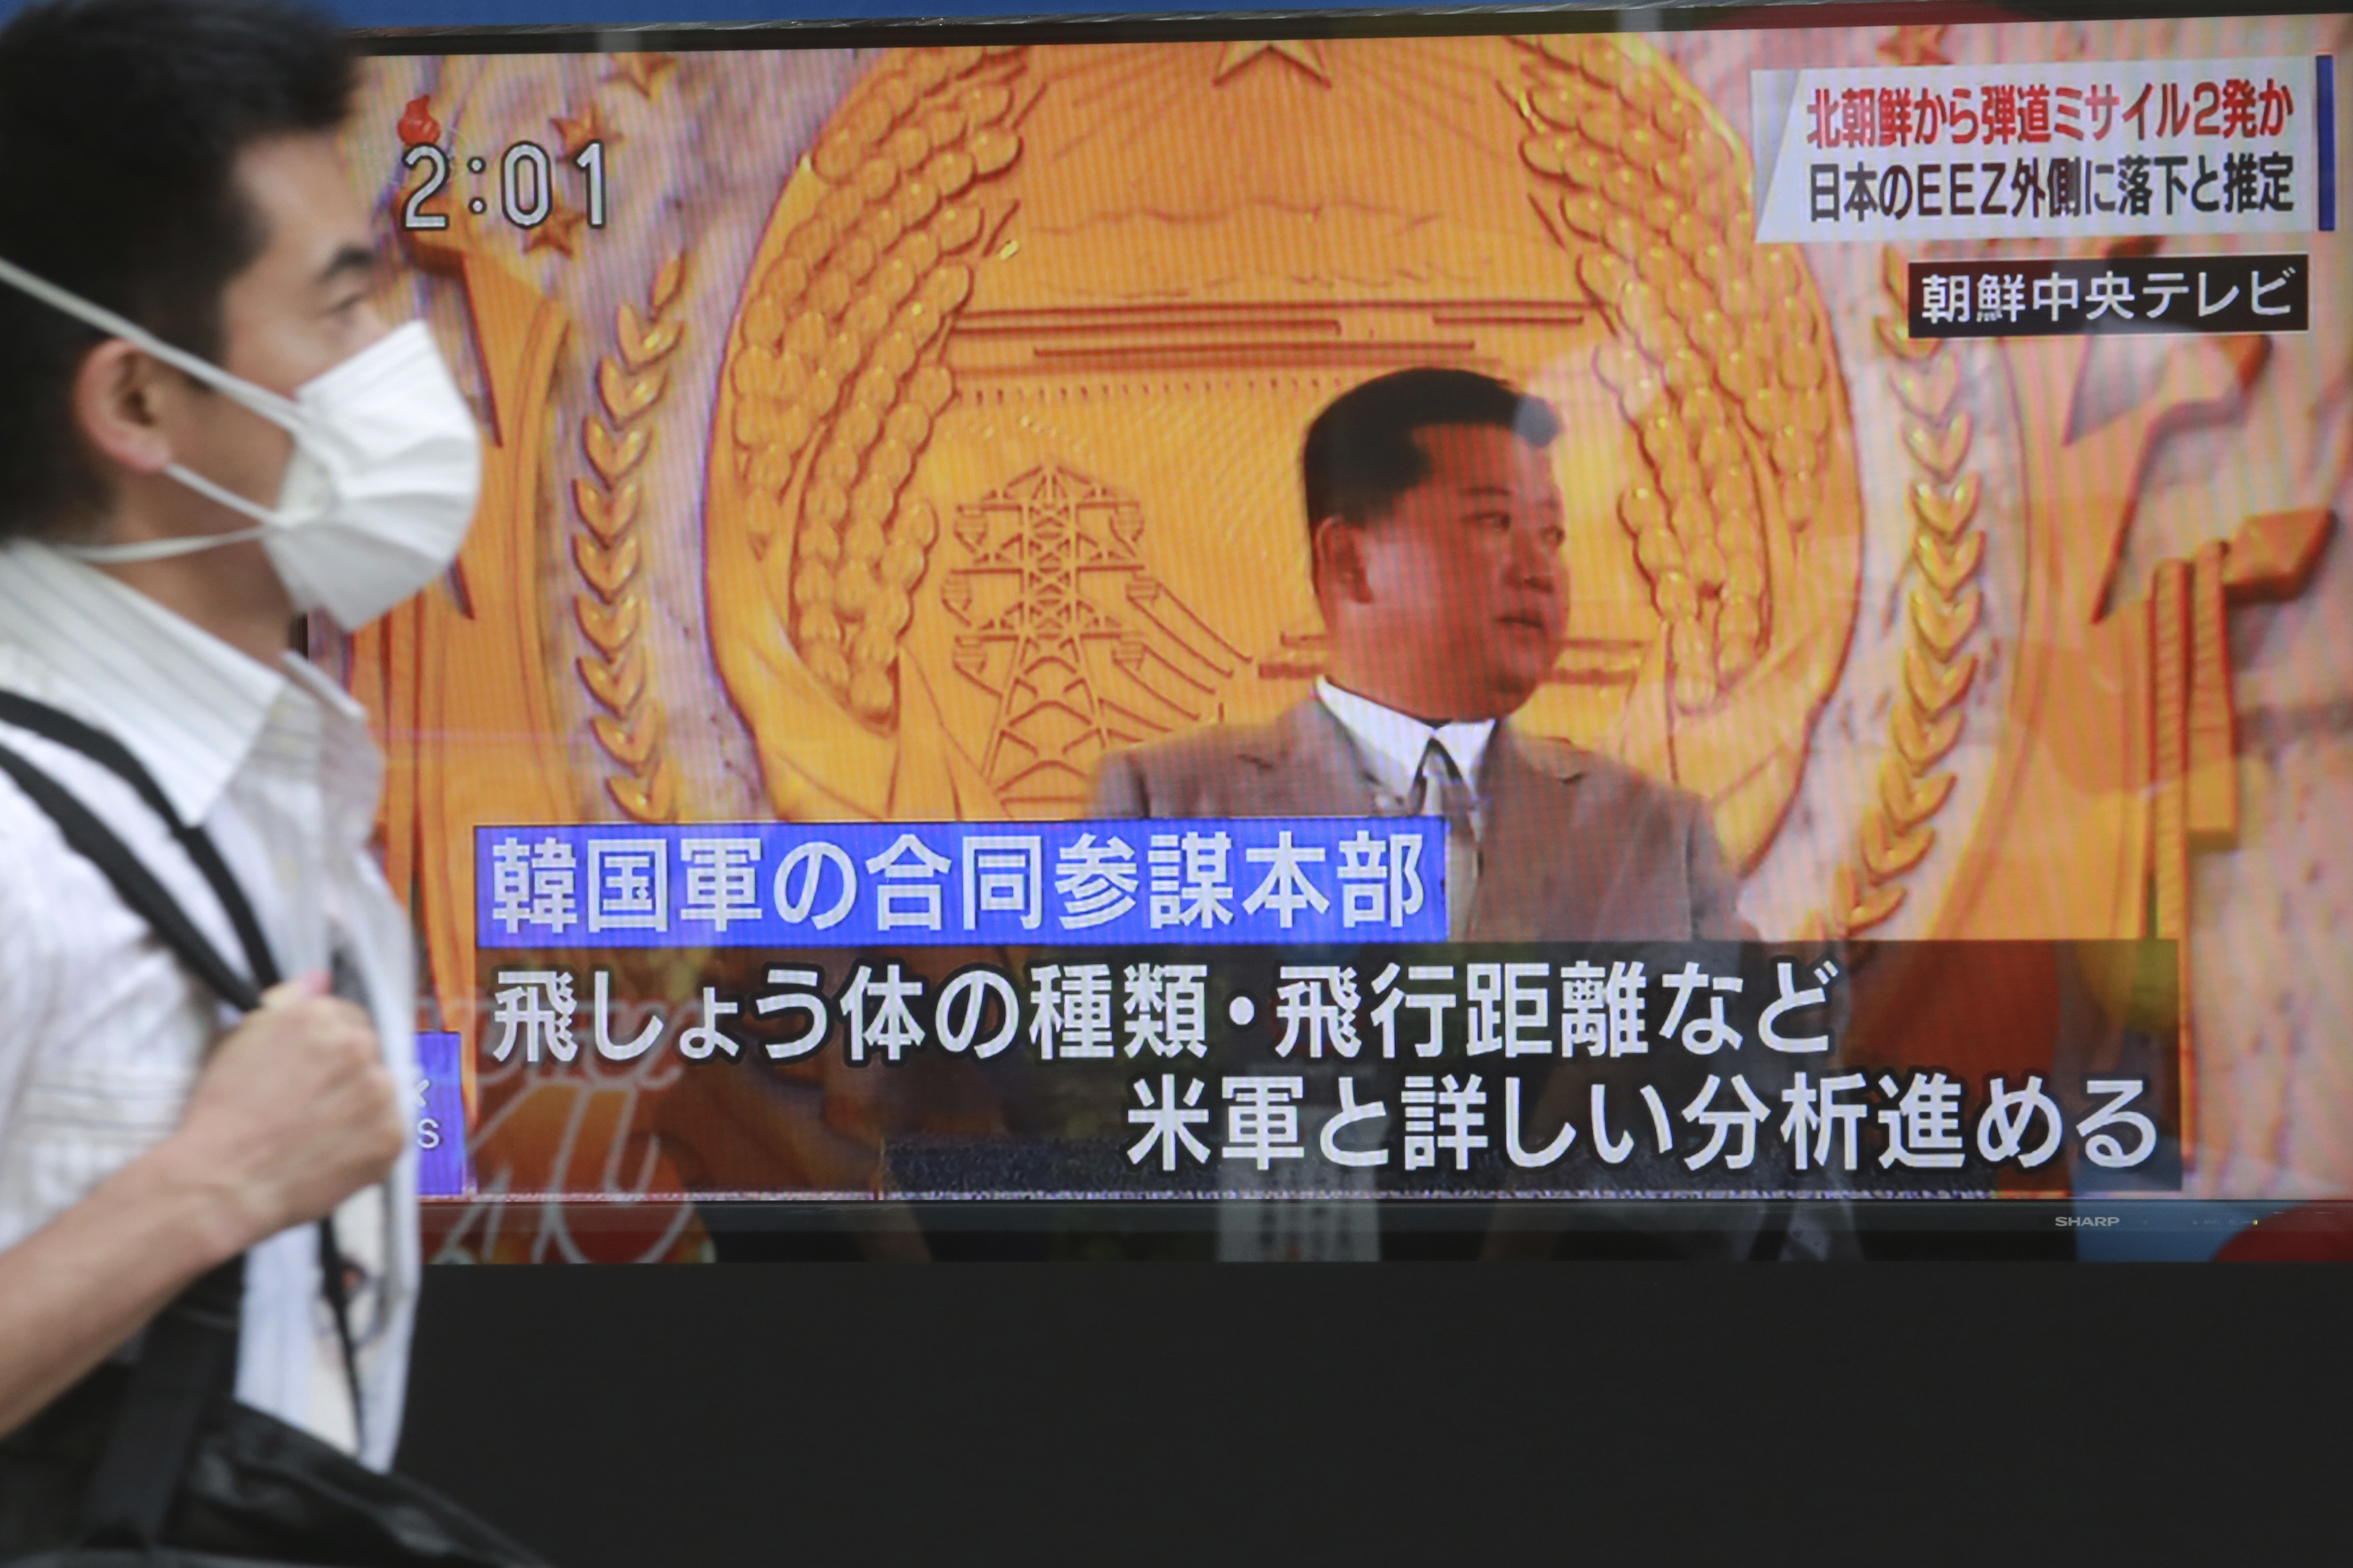 North Korean leader Kim Jong Un on television, in Tokyo.